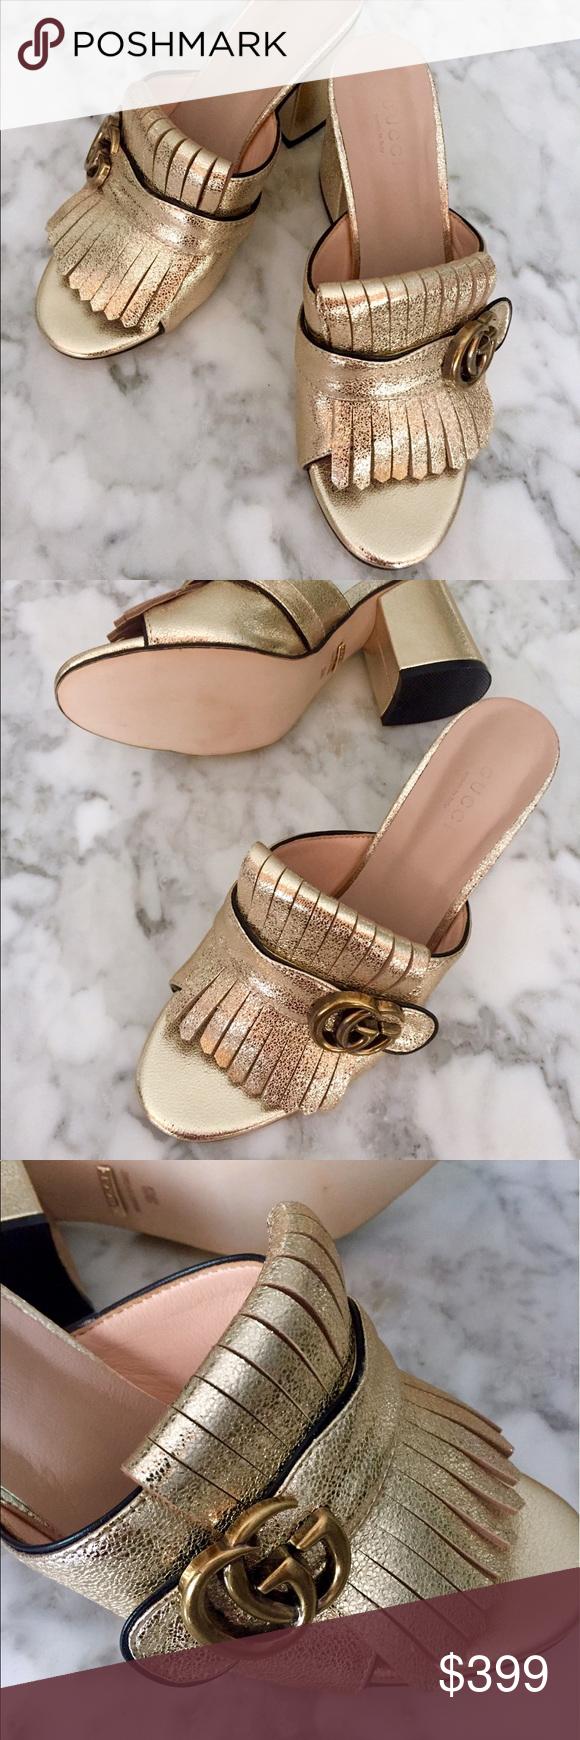 5cbedf60696 GUCCI Marmont Leather Slide Sandals  795 GUCCI Marmont metallic mid heel  slide sandals in size 38. Metallic leather high heel slide sa…